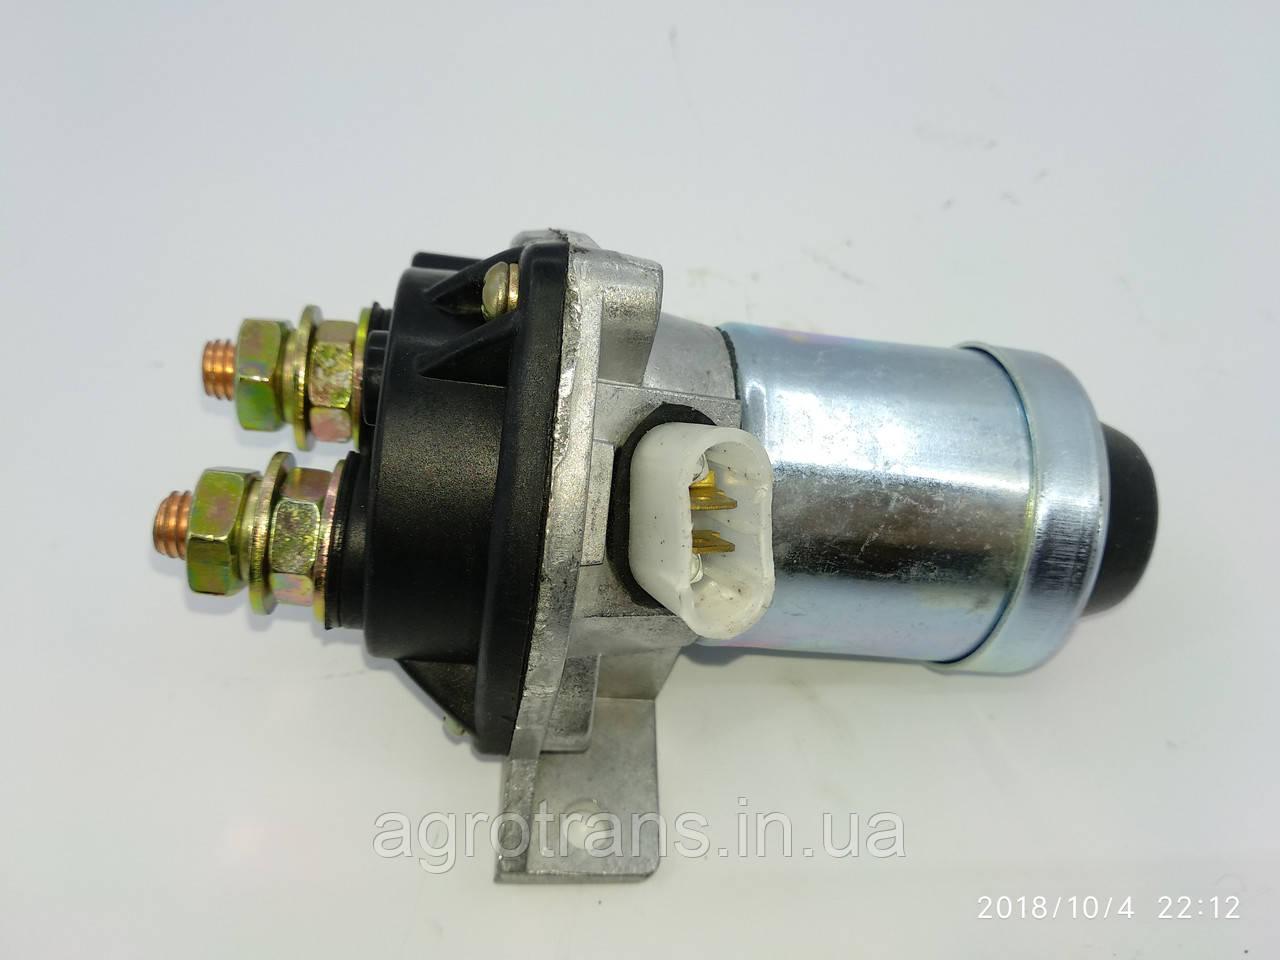 Выключатель массы кнопочный КАМАЗ, МАЗ 5320-3737010-10 (медная катушка)